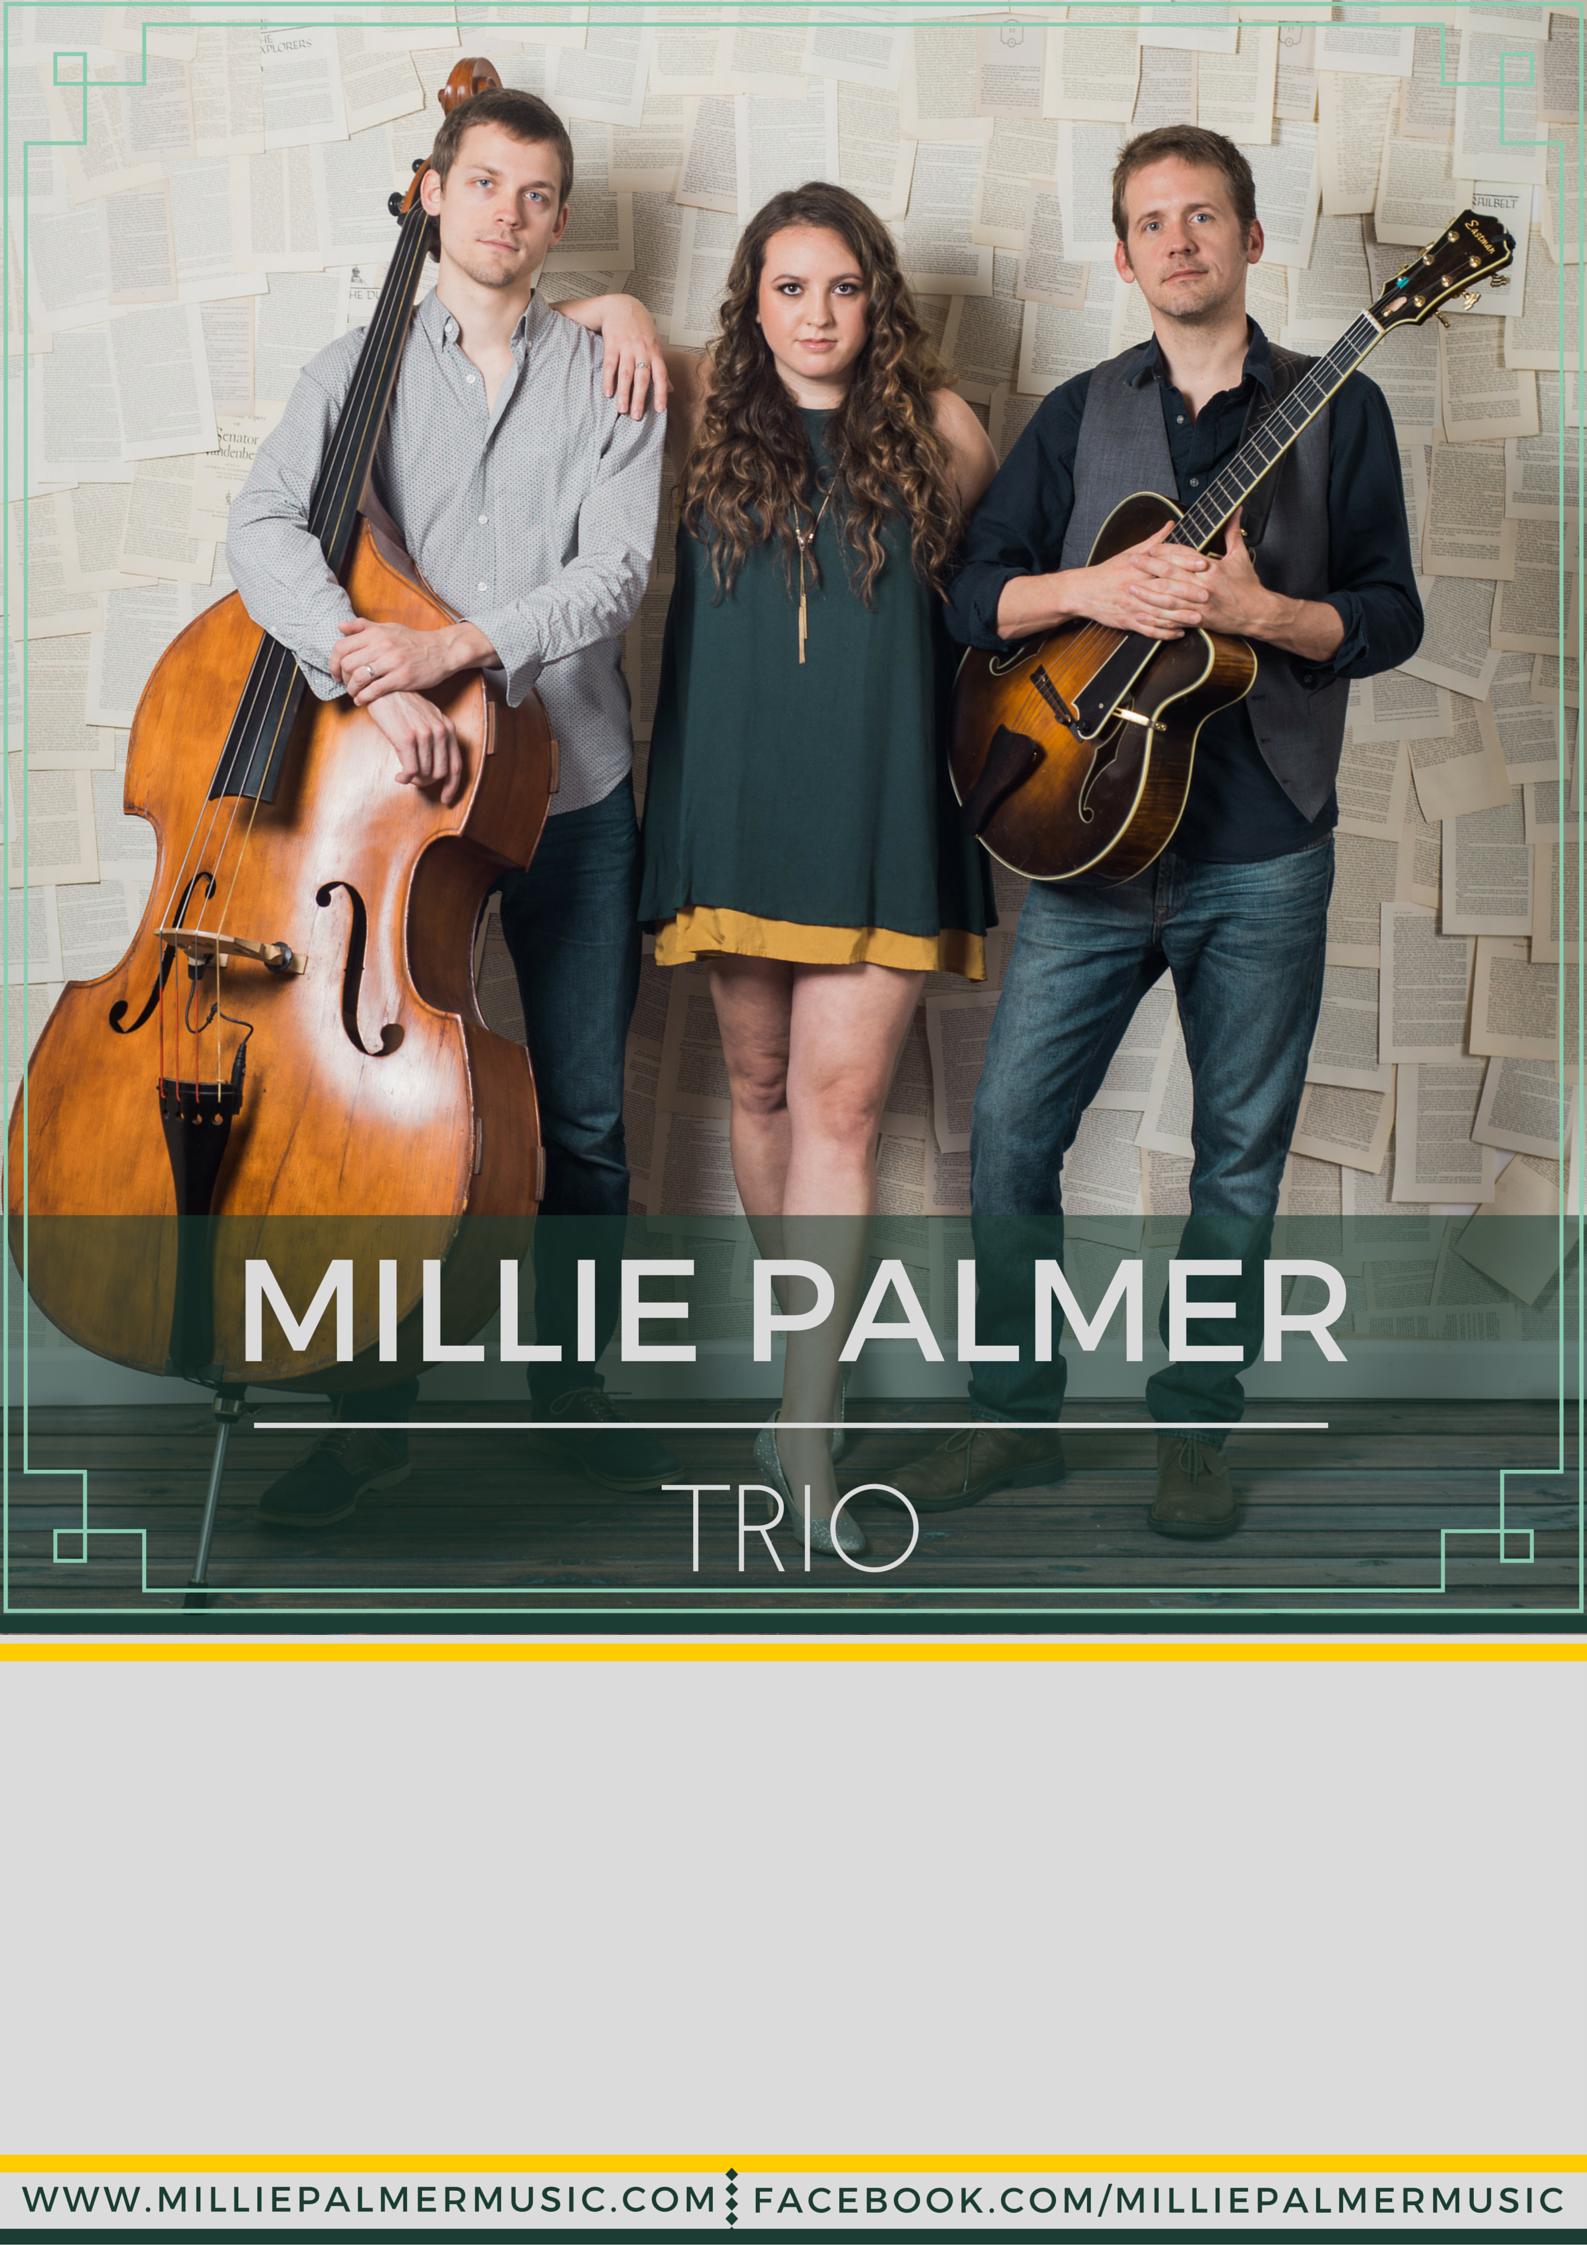 Millie Palmer Trio (1).png